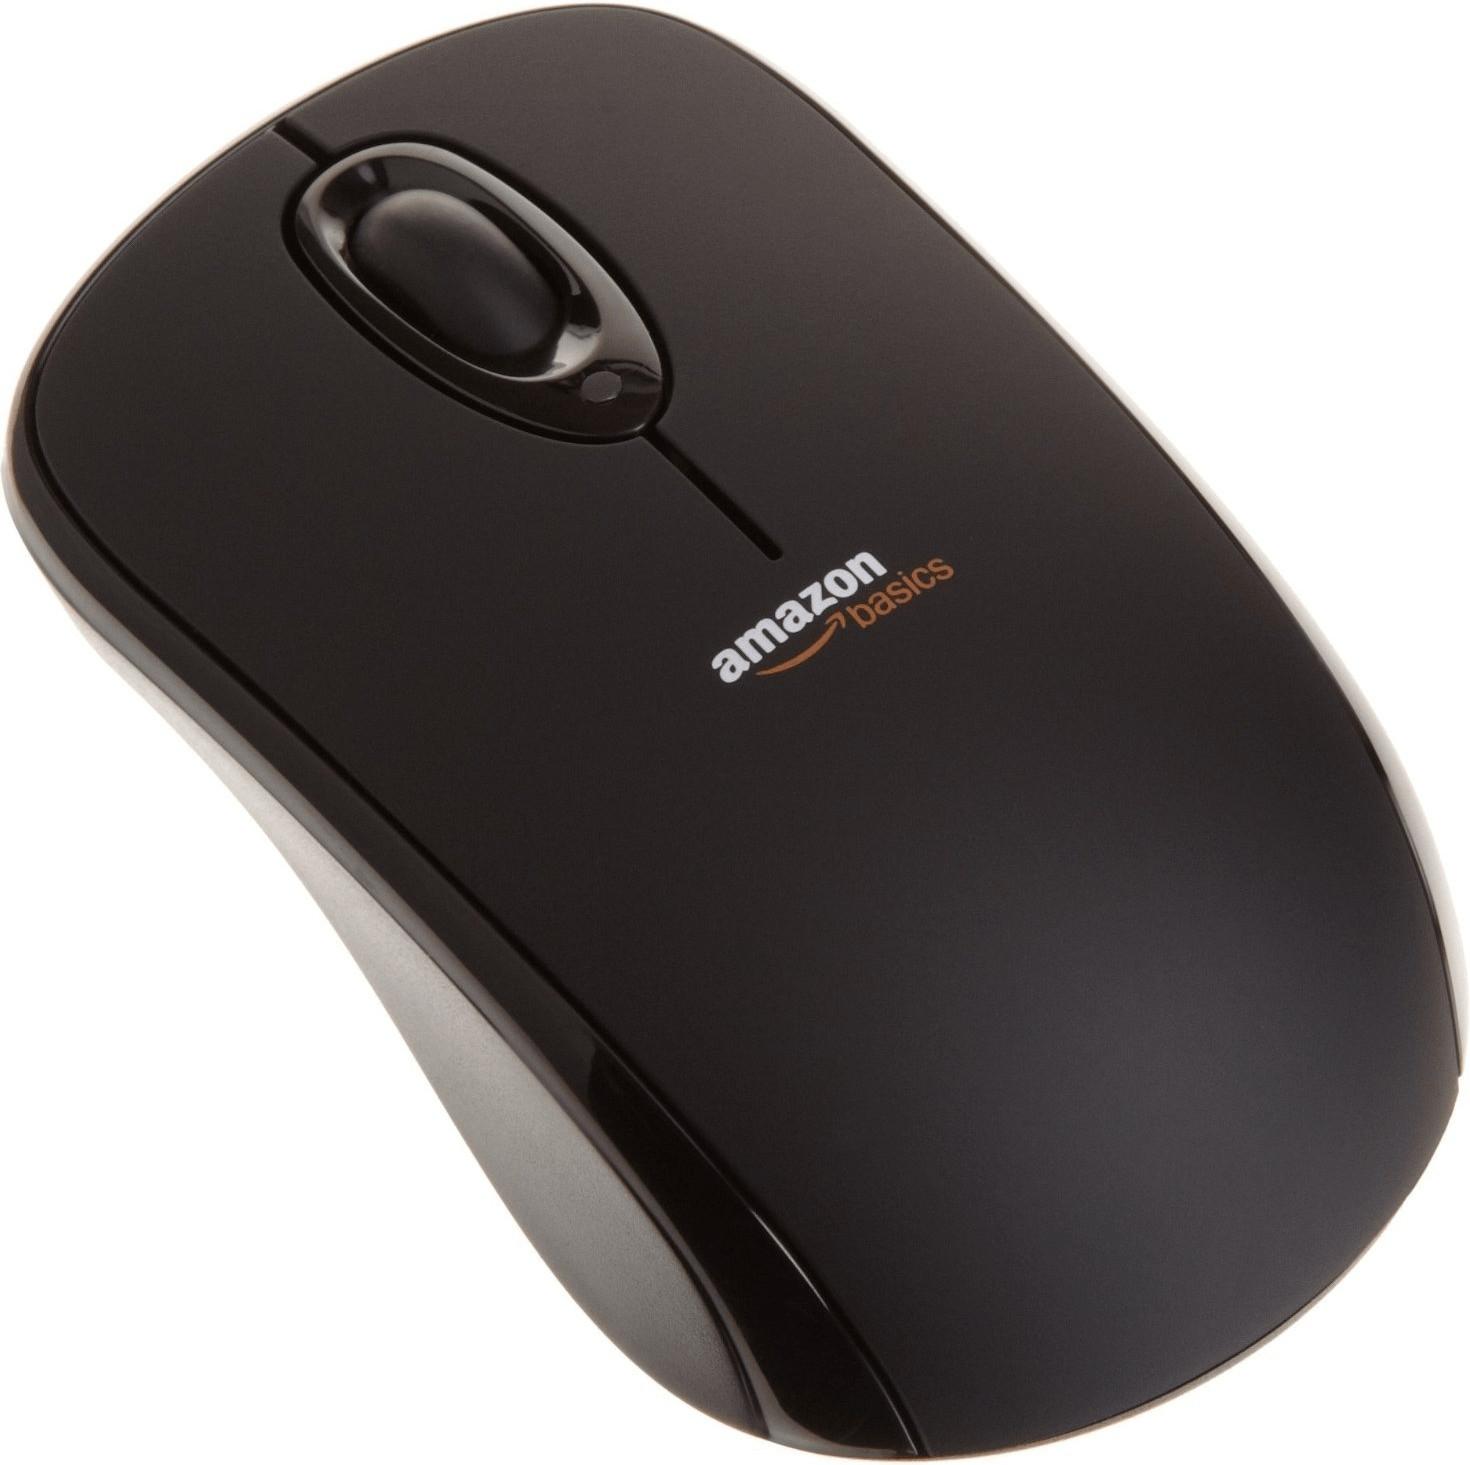 Image of AmazonBasics Wireless Mouse with Nano Receiver Black